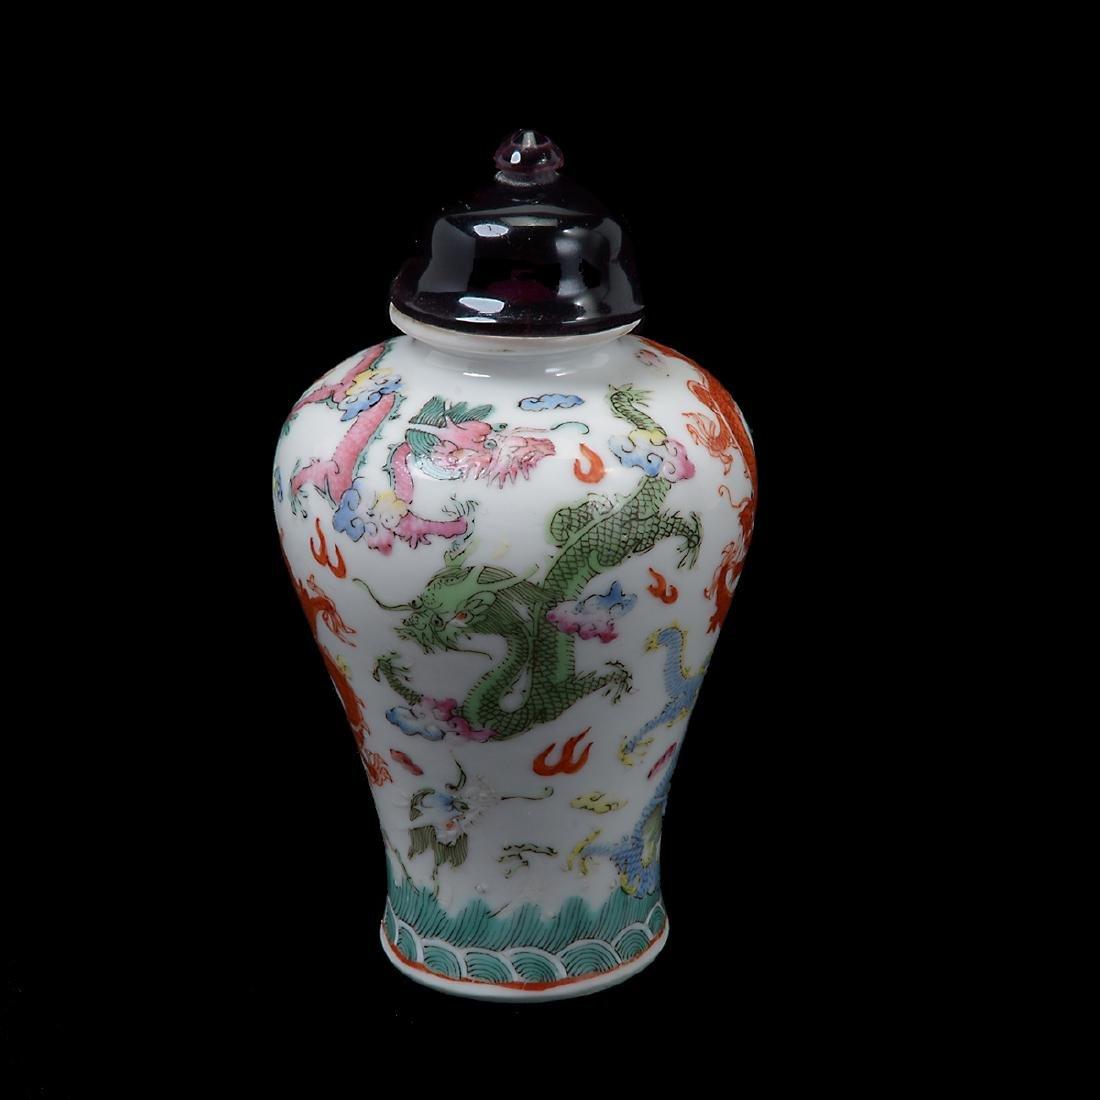 Famille Rose 'Dragon' Snuff Bottle, 19th Century - 2